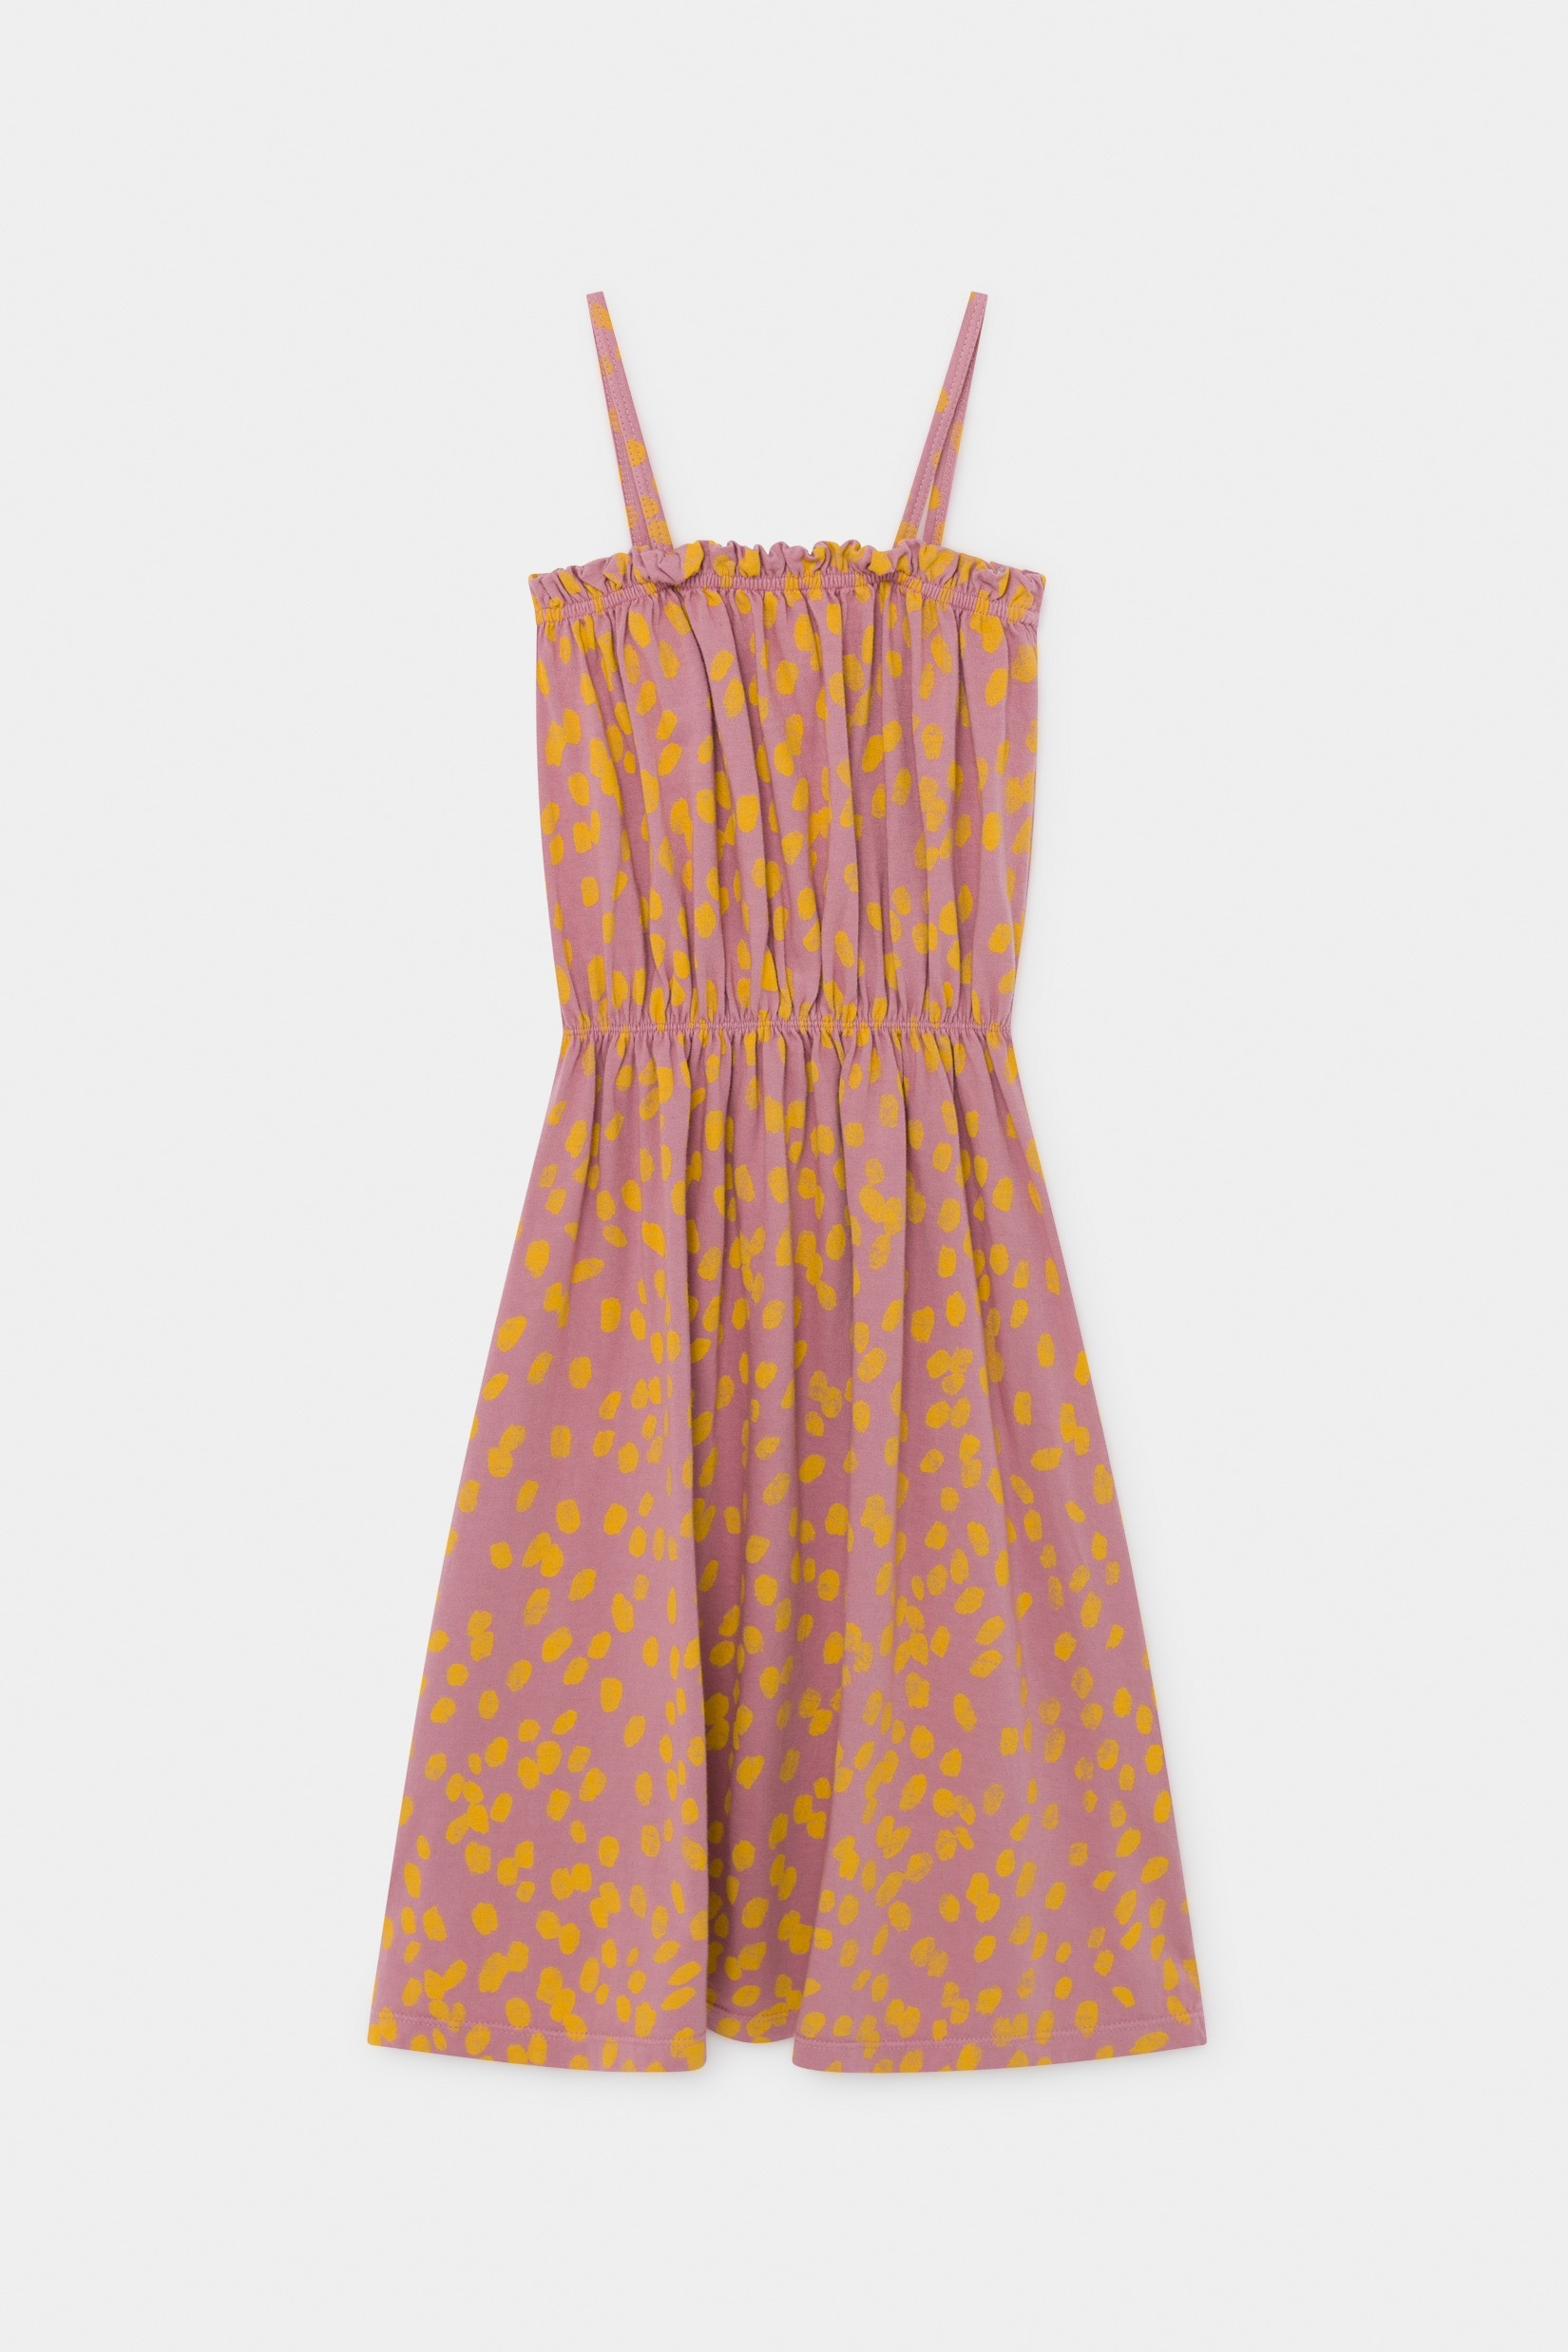 《BOBO CHOSES 2020SS》Animal Print Jersey Dress / 2-9Y